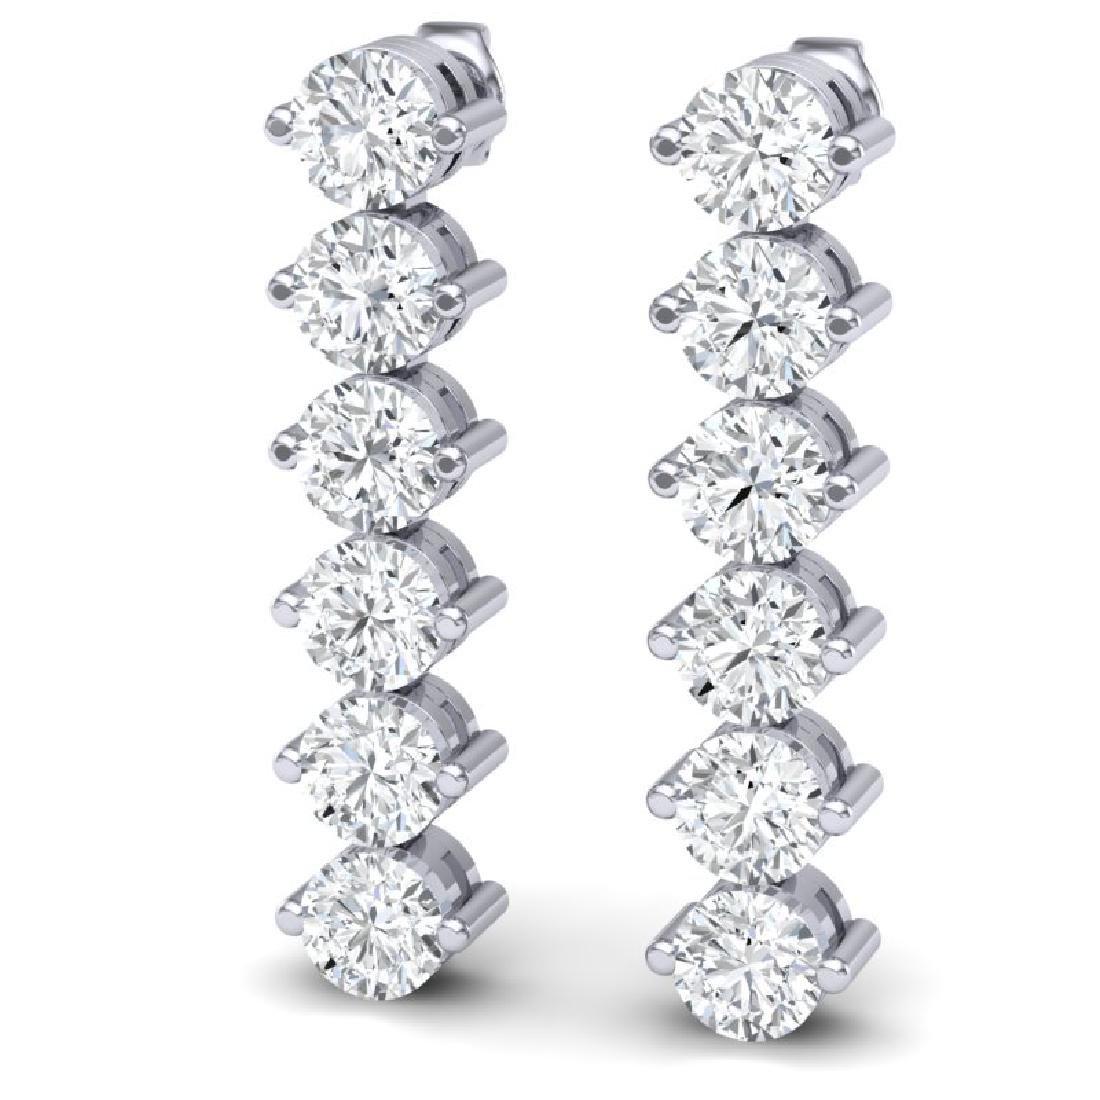 6 CTW Certified SI/I Diamond Earrings 18K White Gold - 2